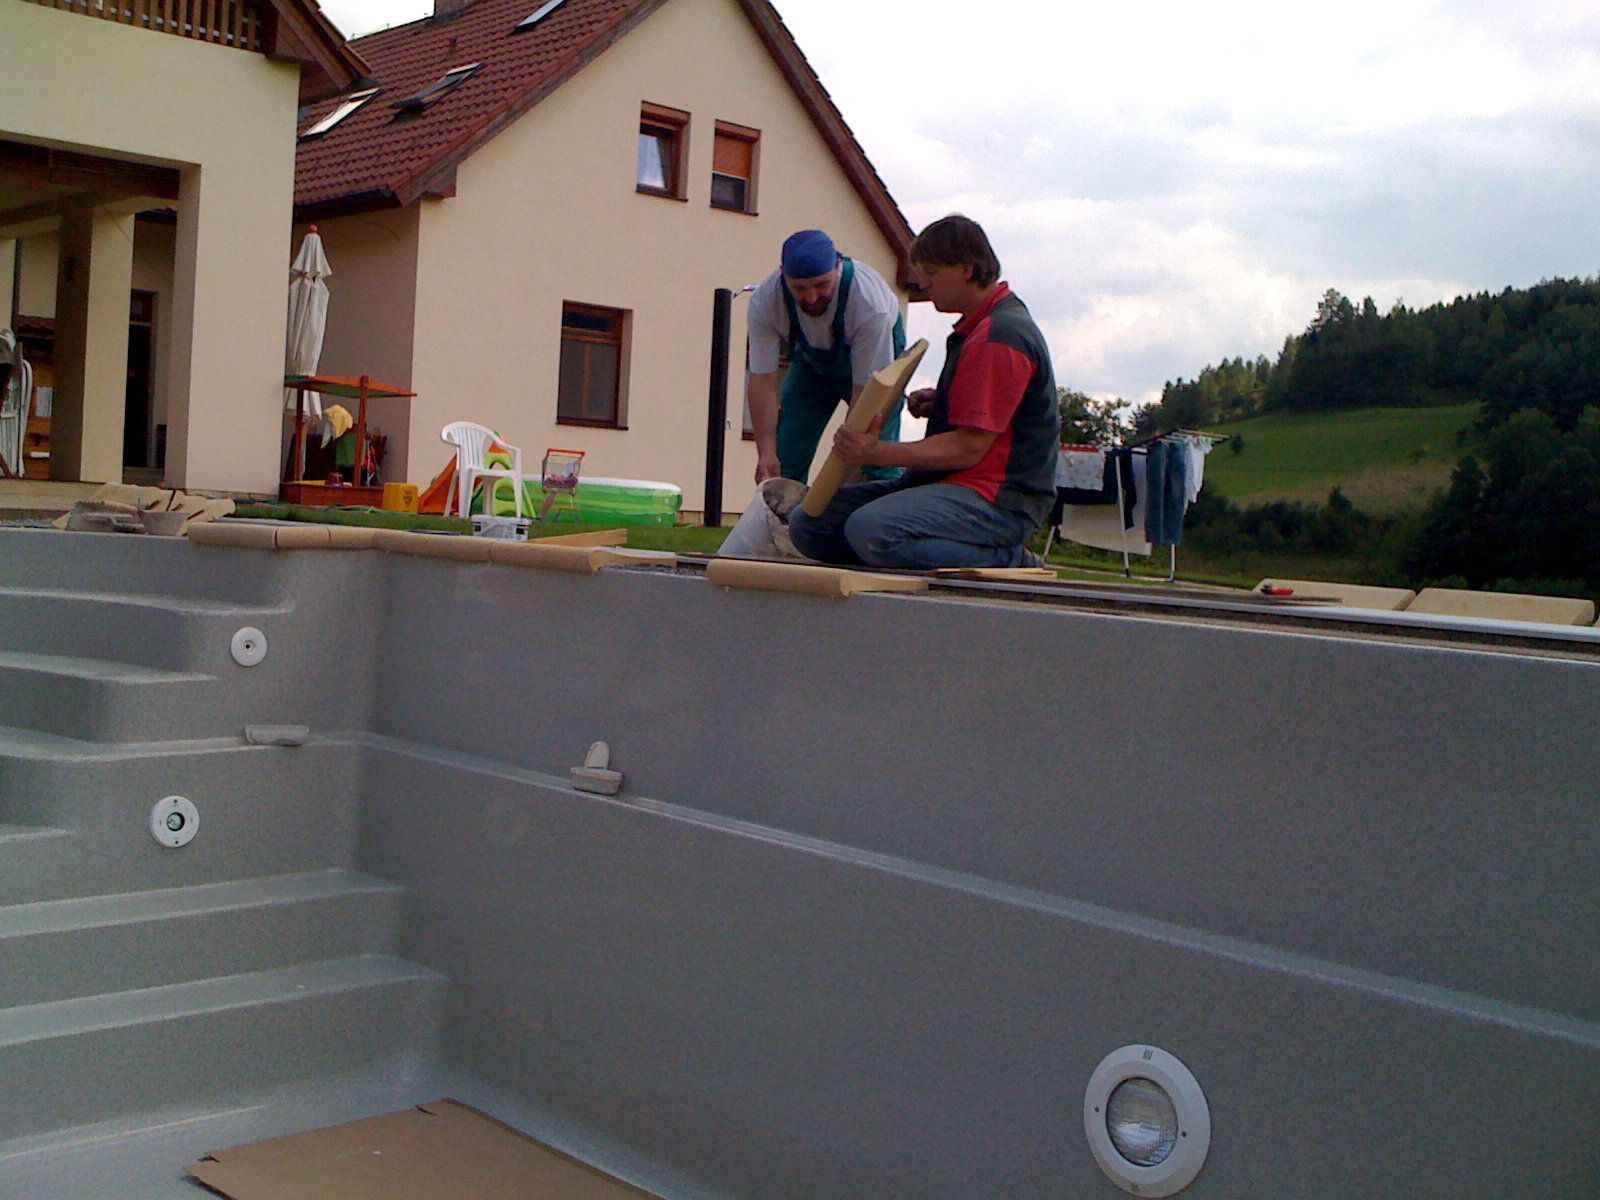 Položení keramického okraje okolo bazénu